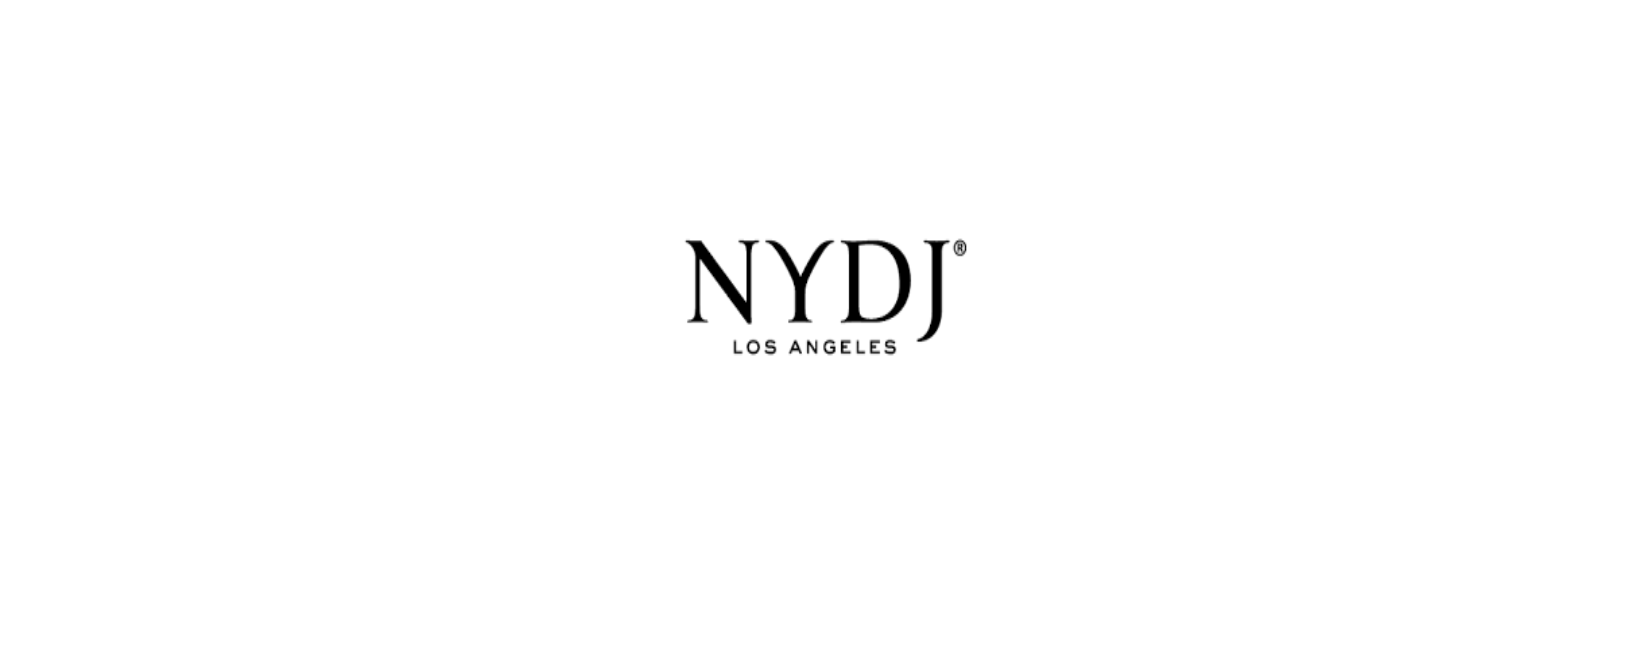 NYDJ Discount Code 2021